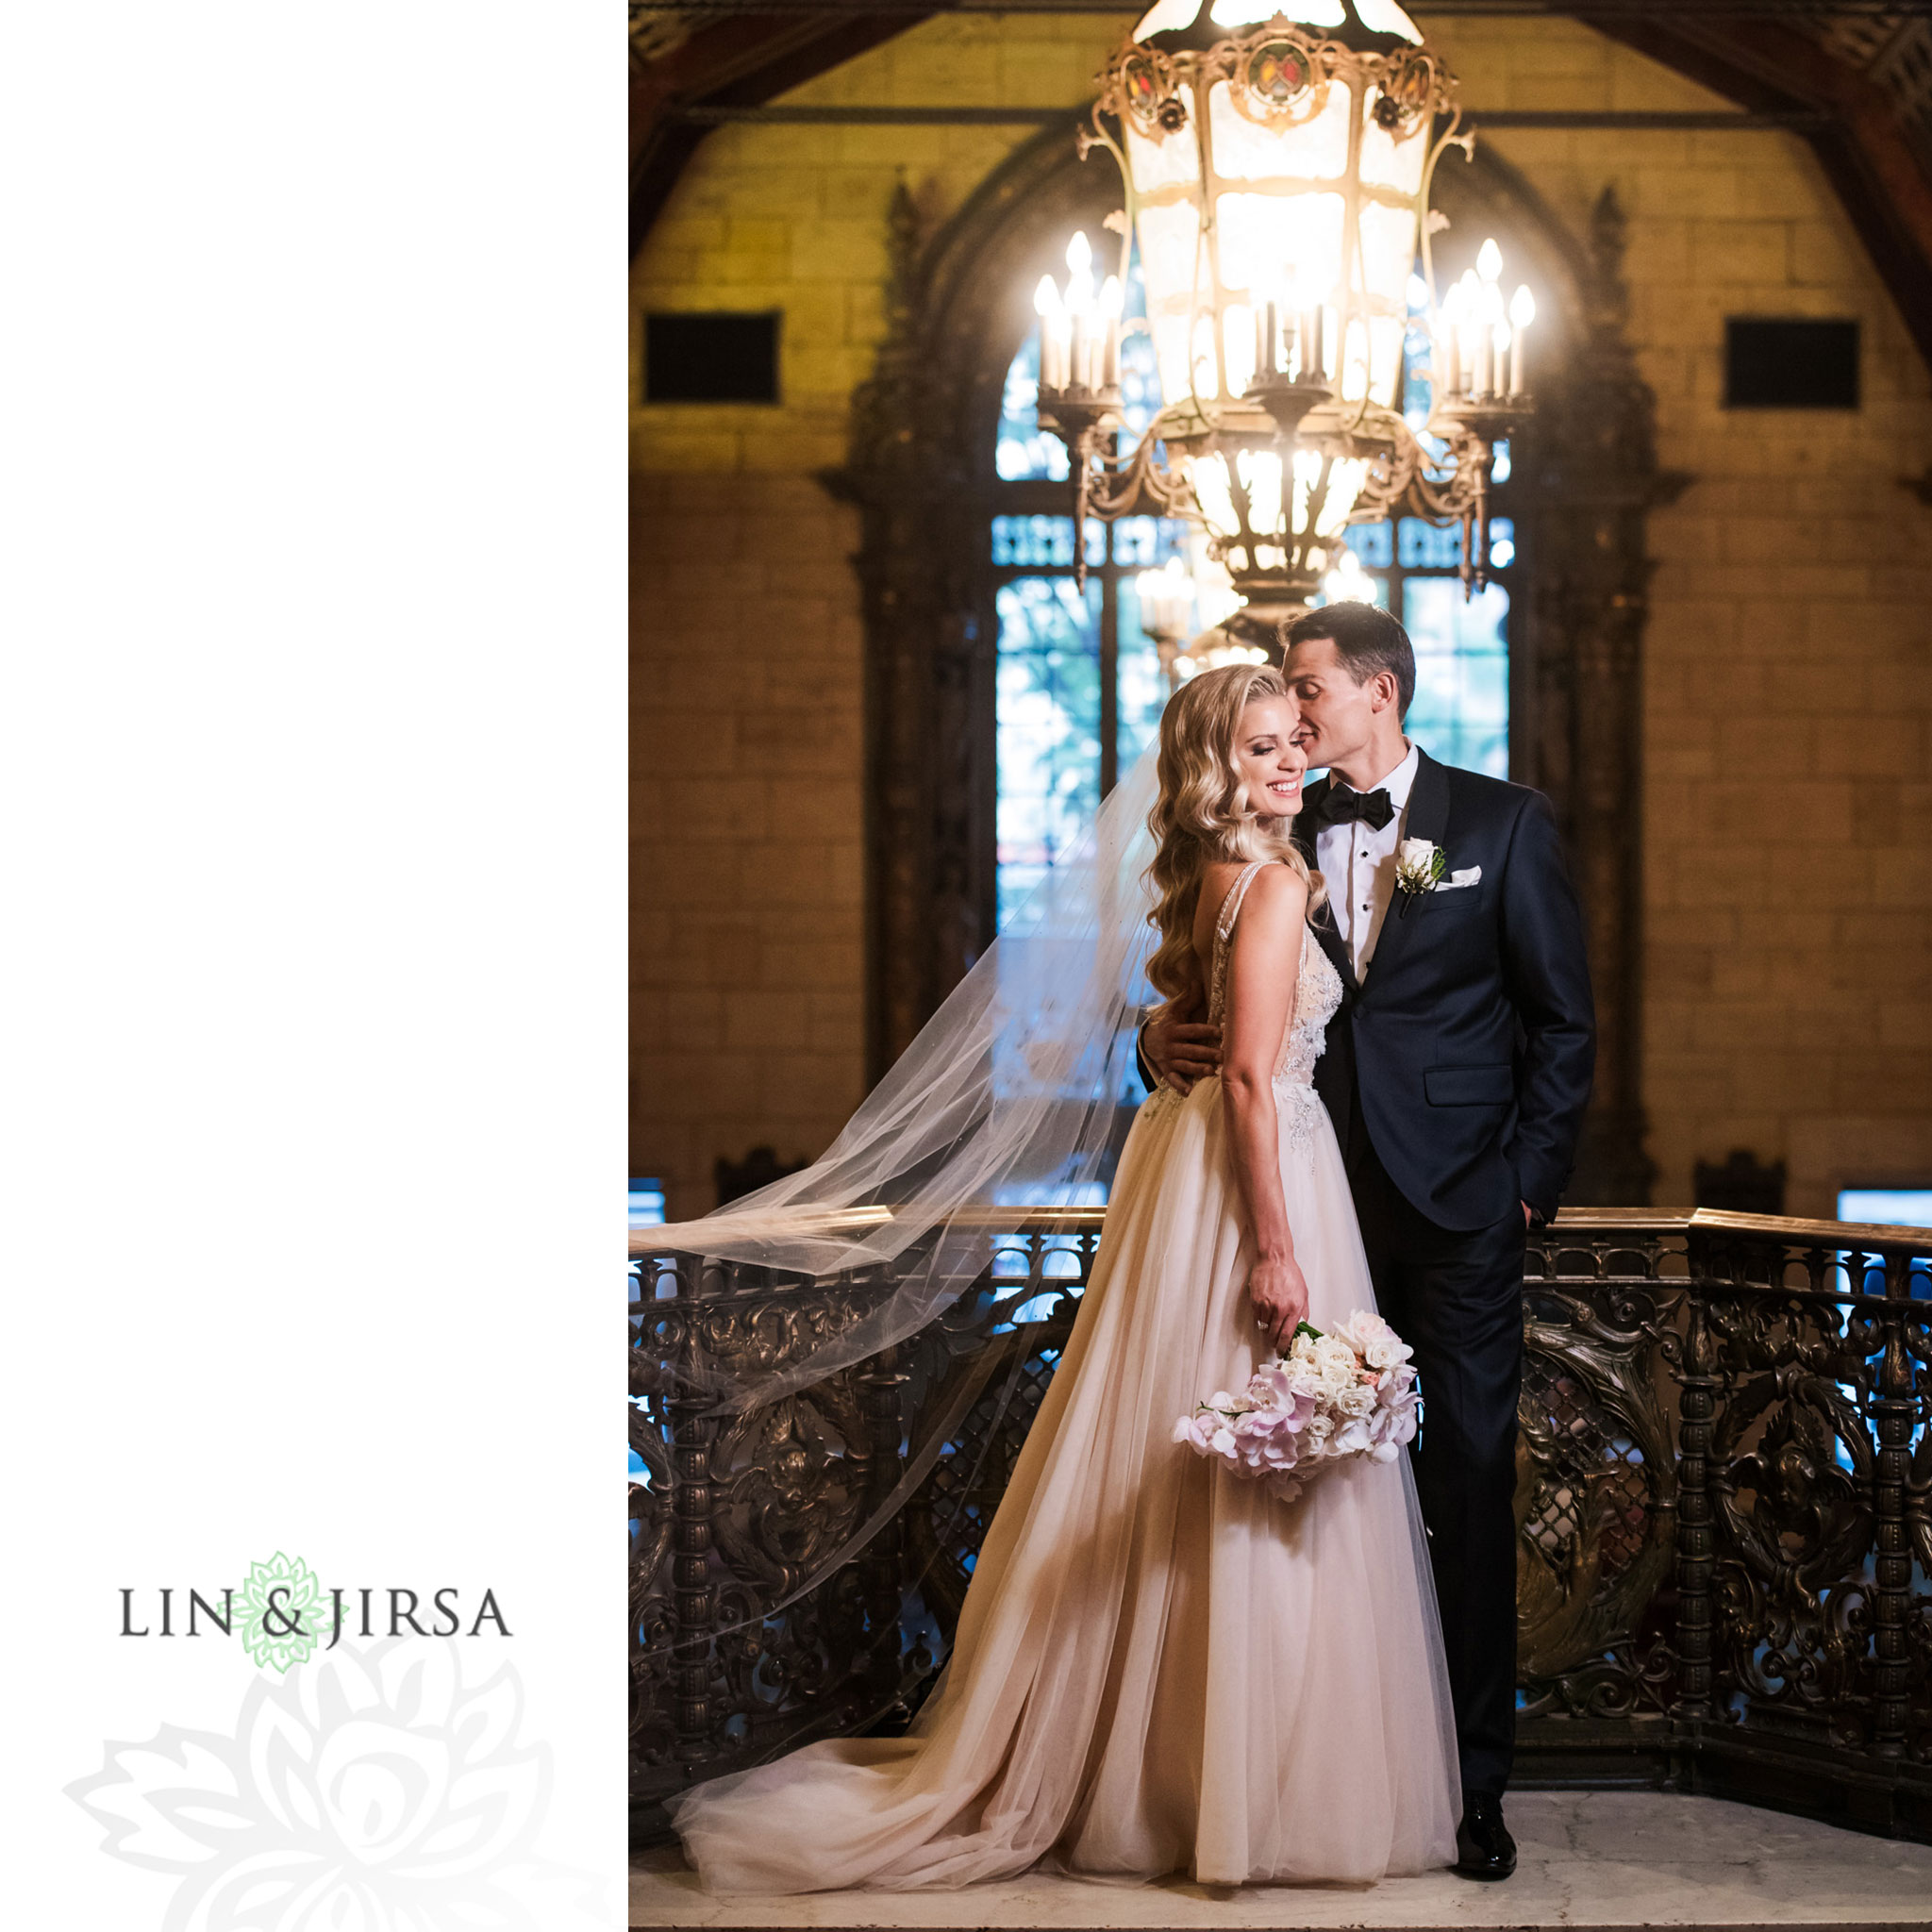 017 millennium biltmore hotel los angeles wedding photography